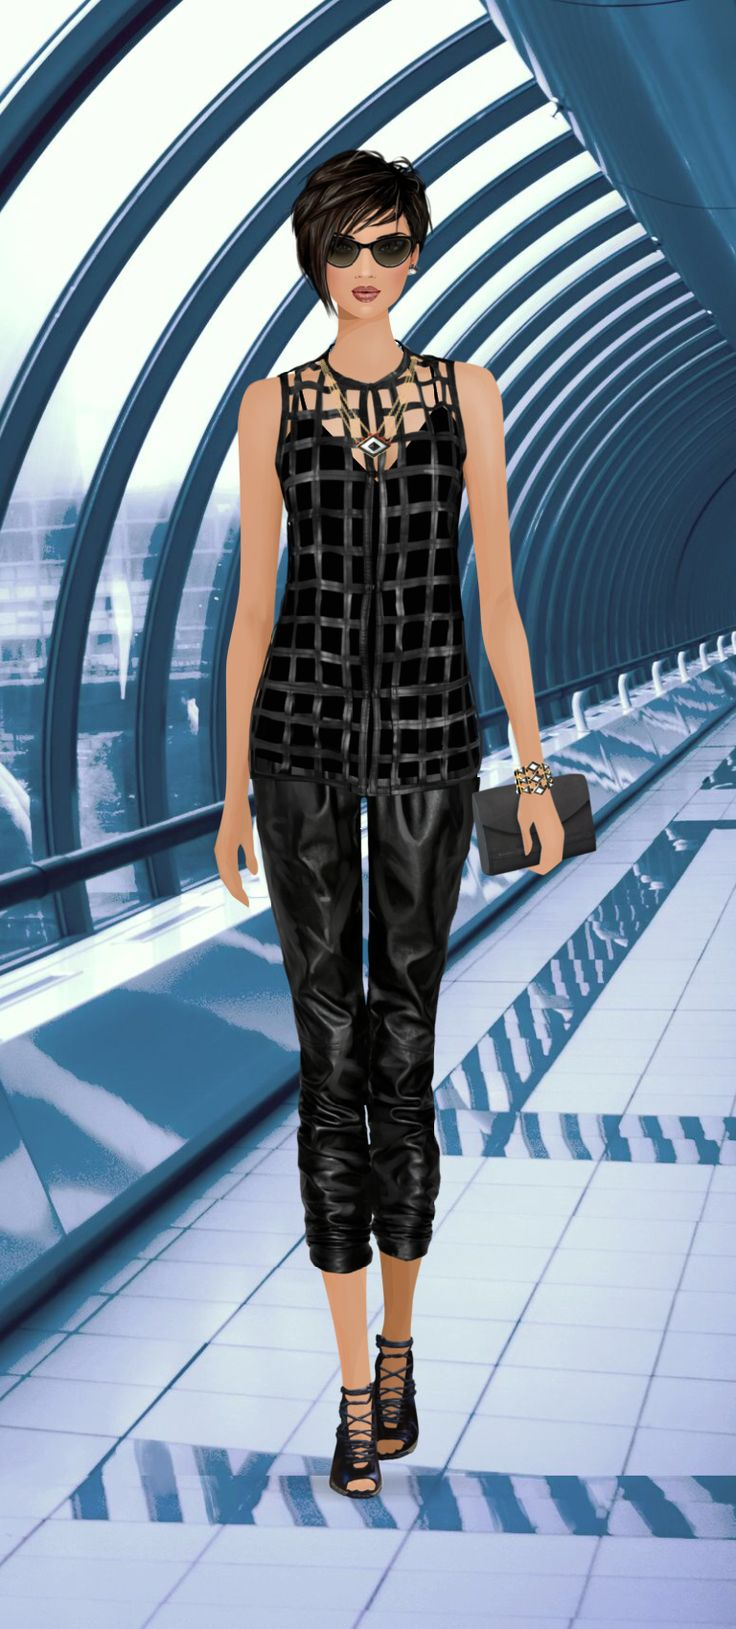 112 Best Covet Fashion Game Images On Pinterest Covet Fashion Dolls And Fashion Games